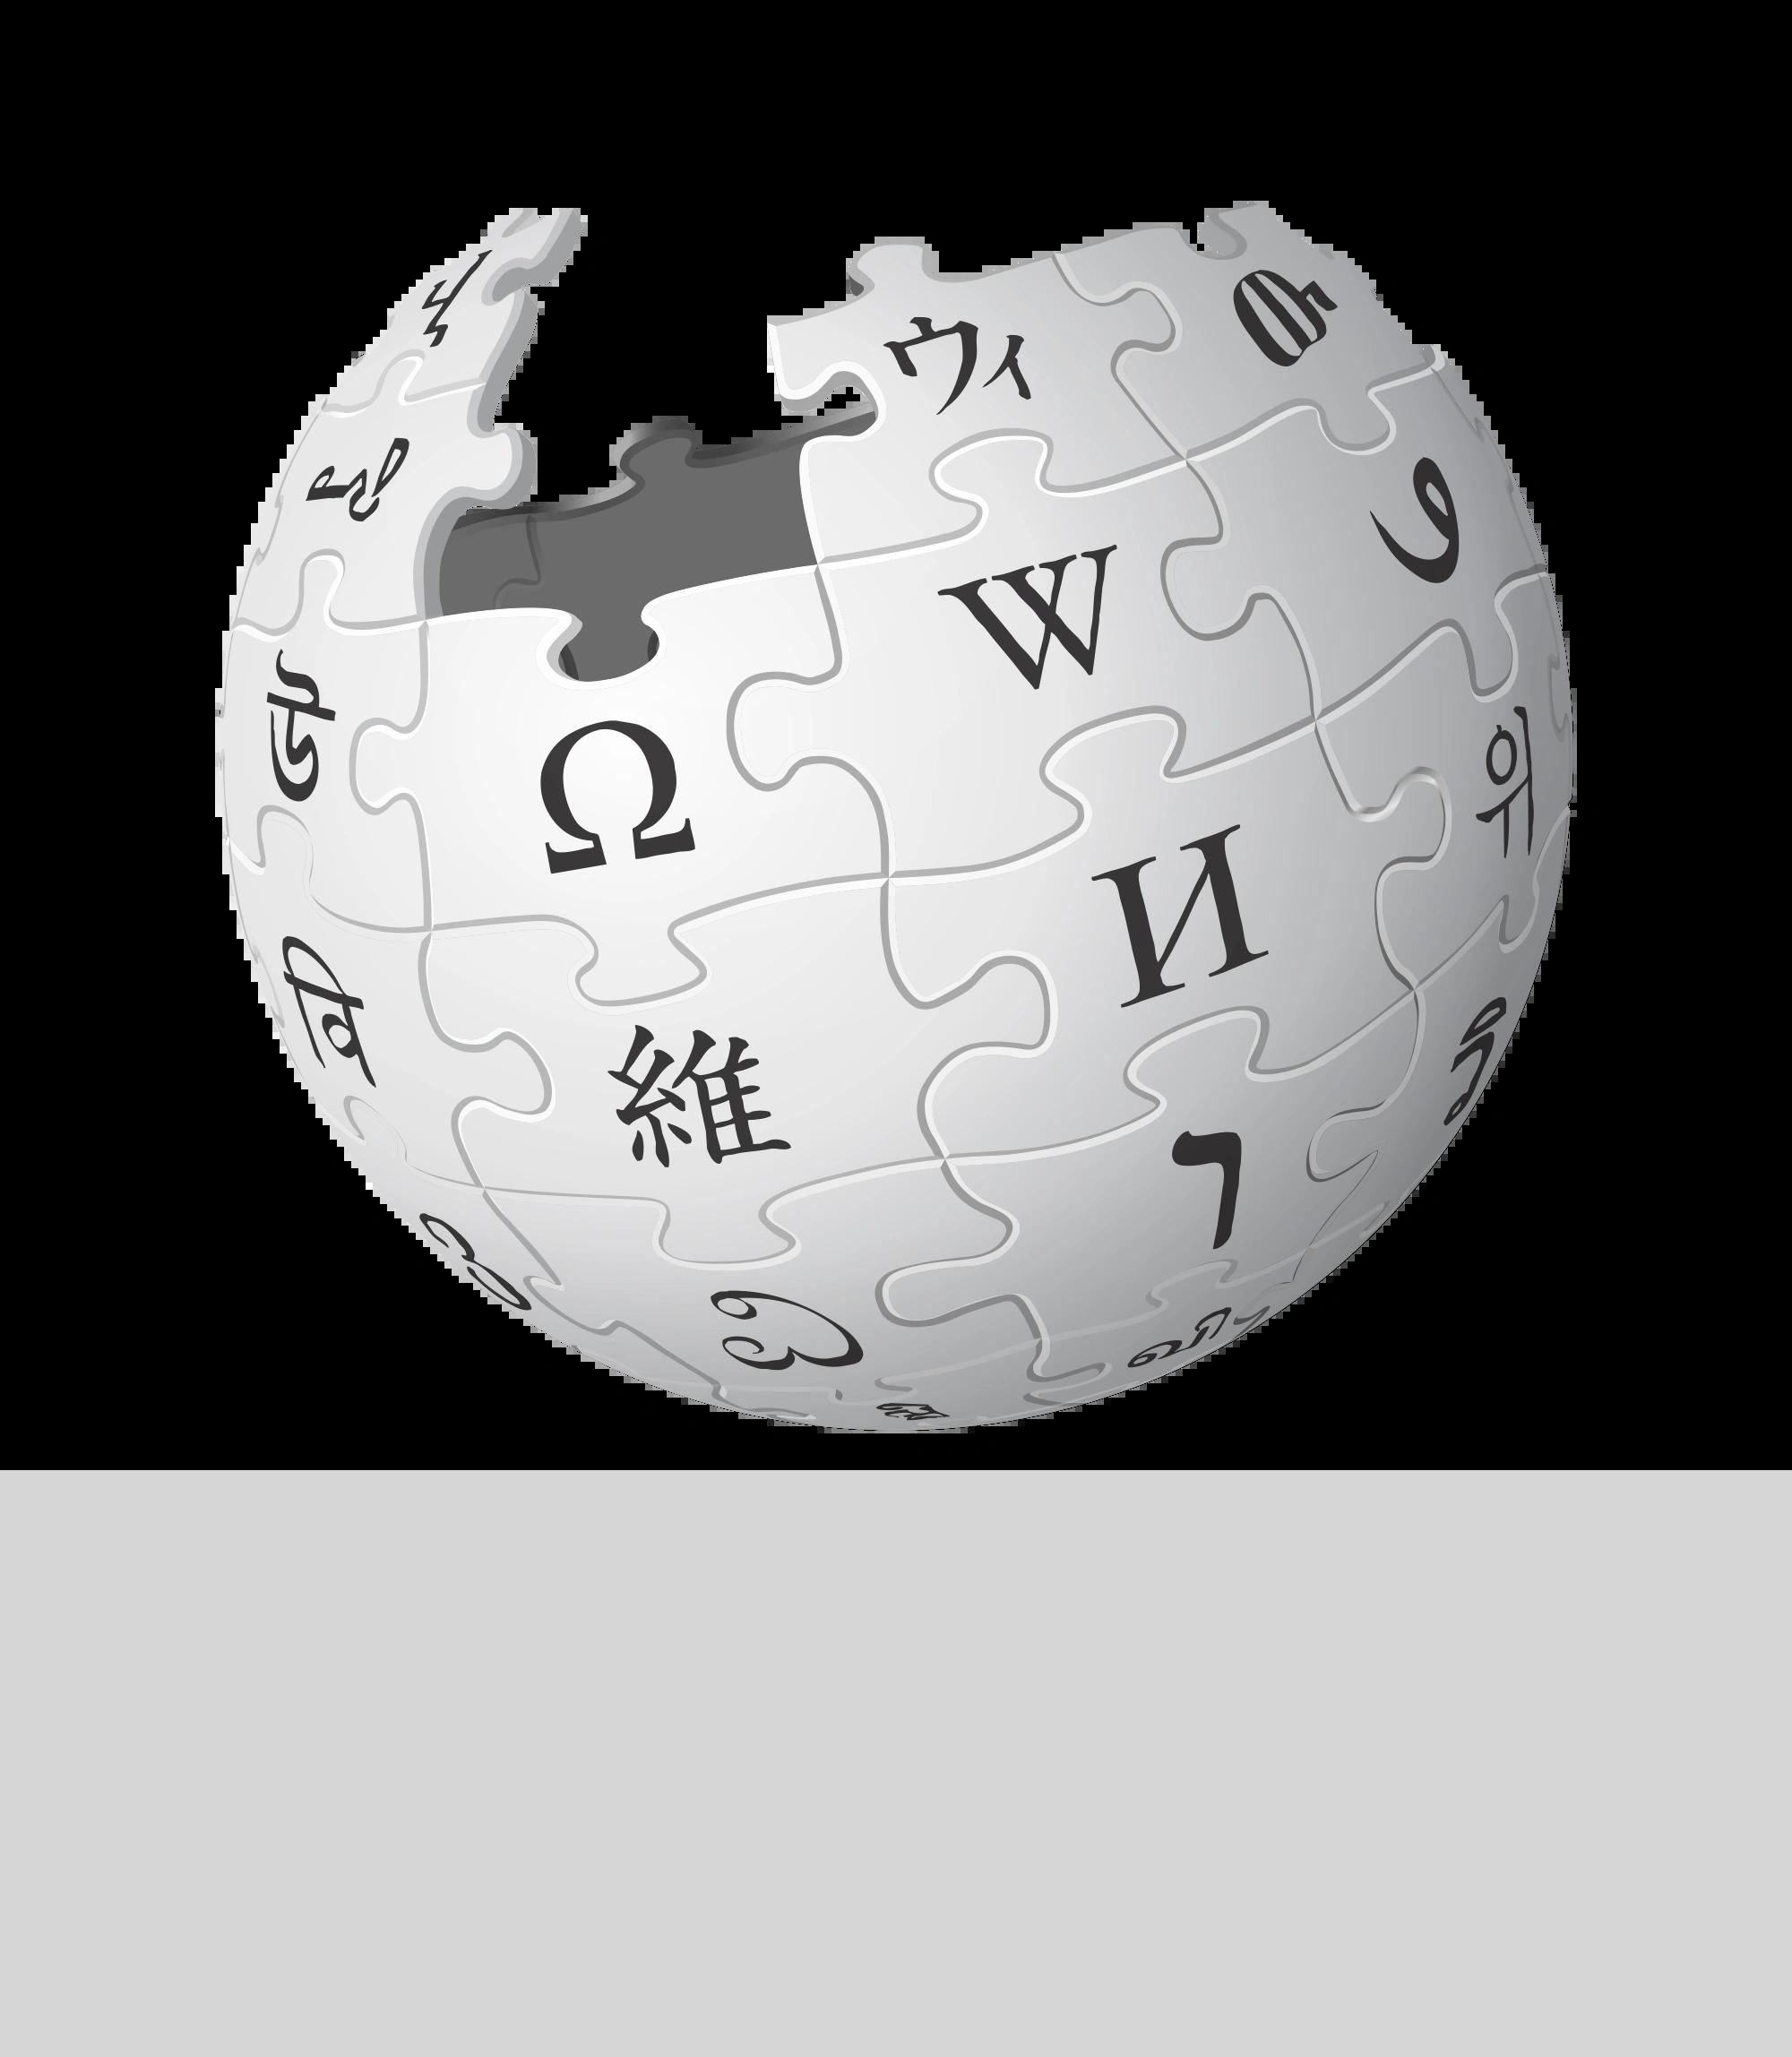 Resultado de imagen para logo wikipedia png